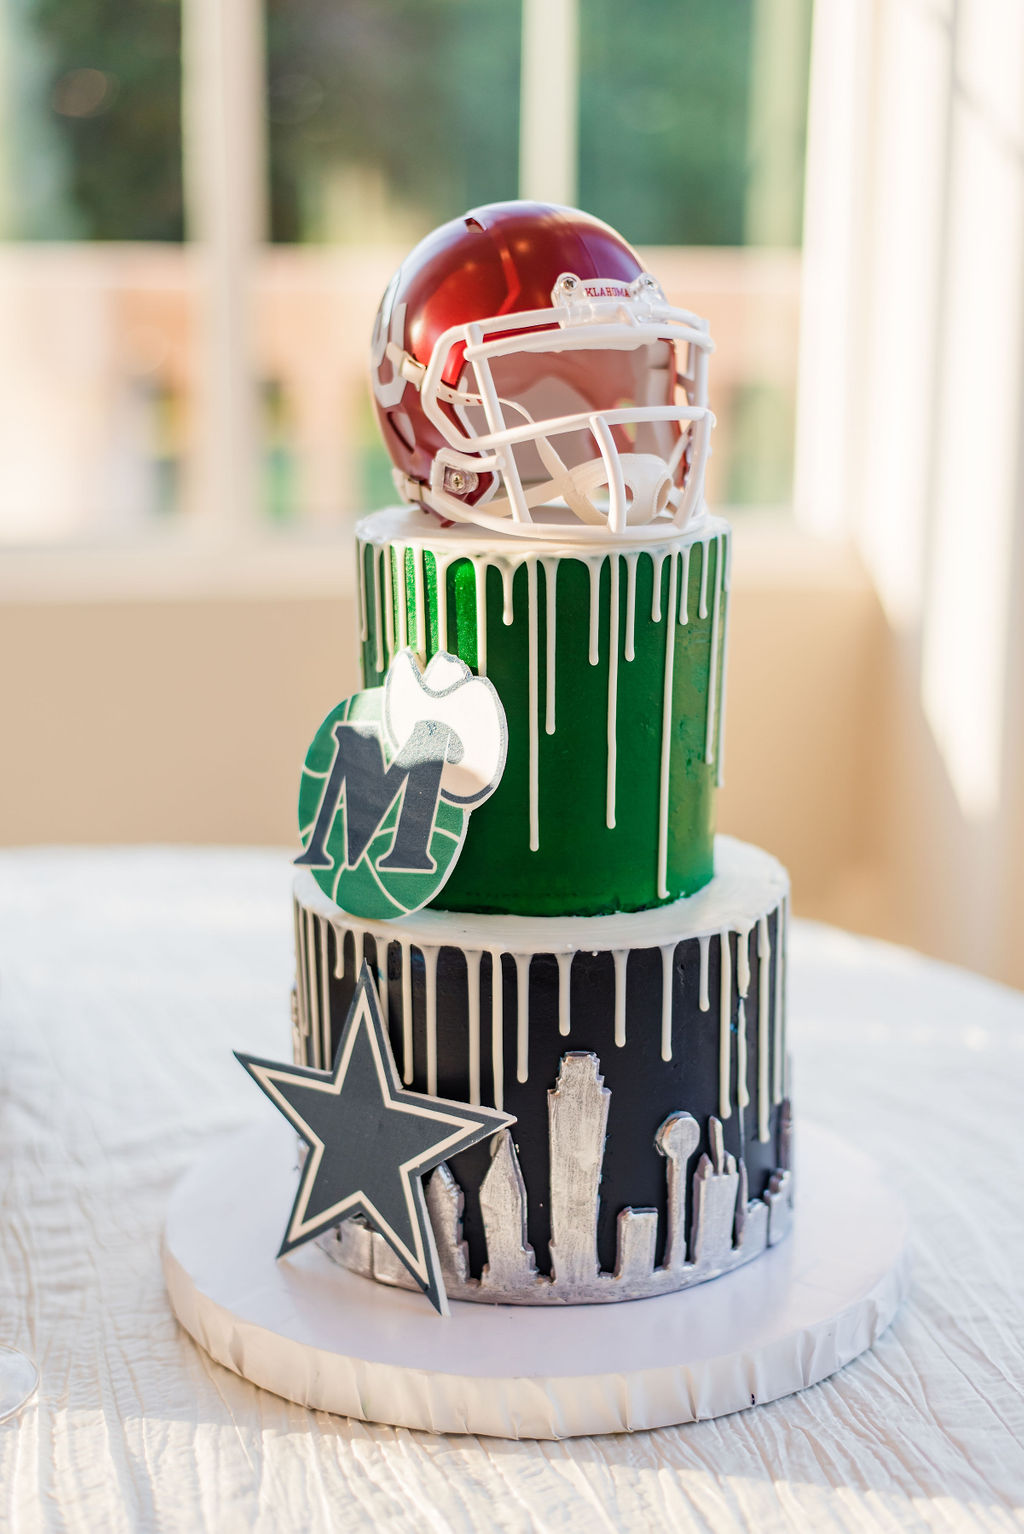 Football groomsman cake